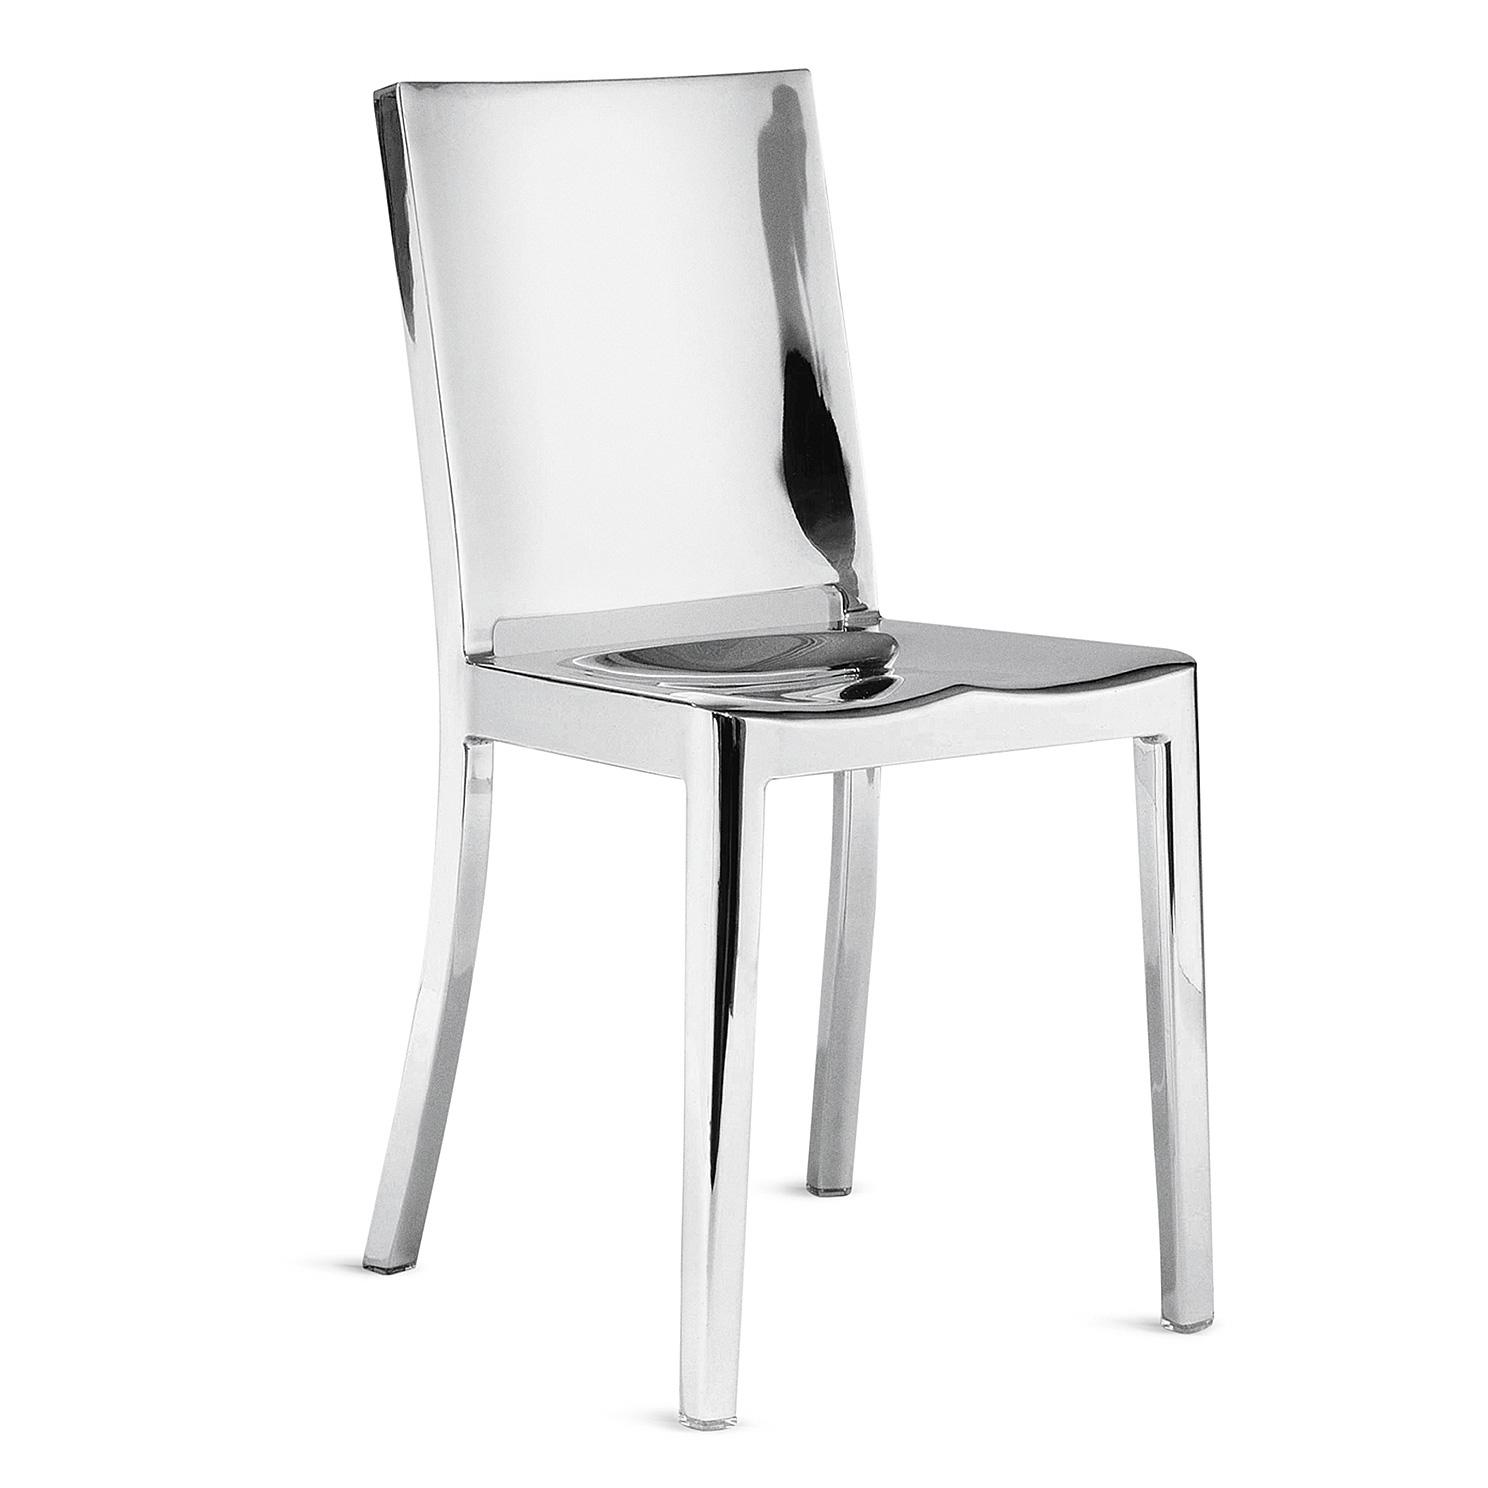 emeco hudson chair  aluminium polished  designed by philippe starck -